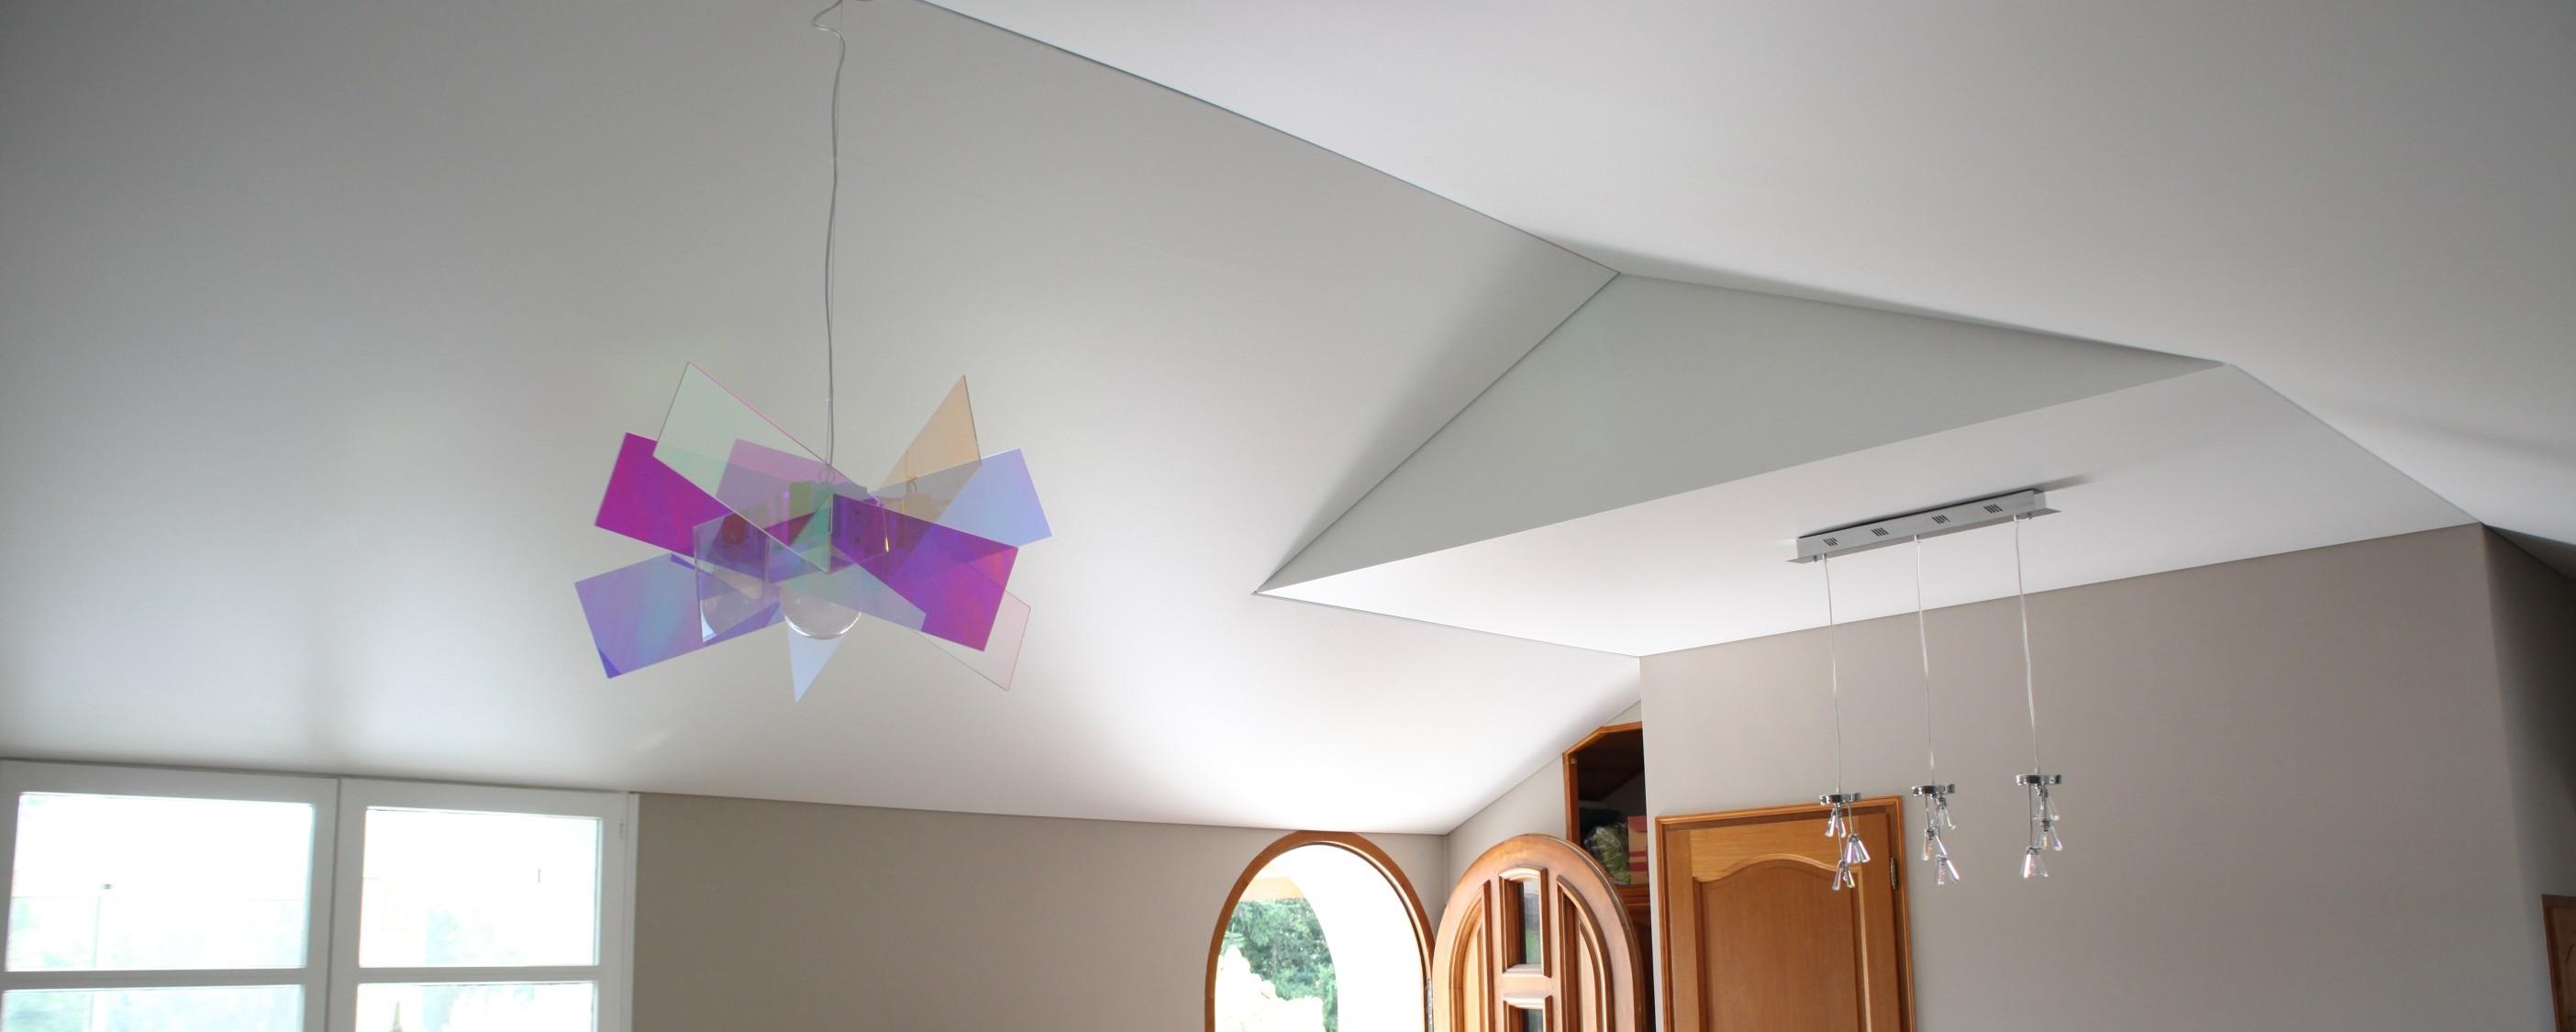 plafond rampant plafond tendu blanc mat rampant je sais. Black Bedroom Furniture Sets. Home Design Ideas